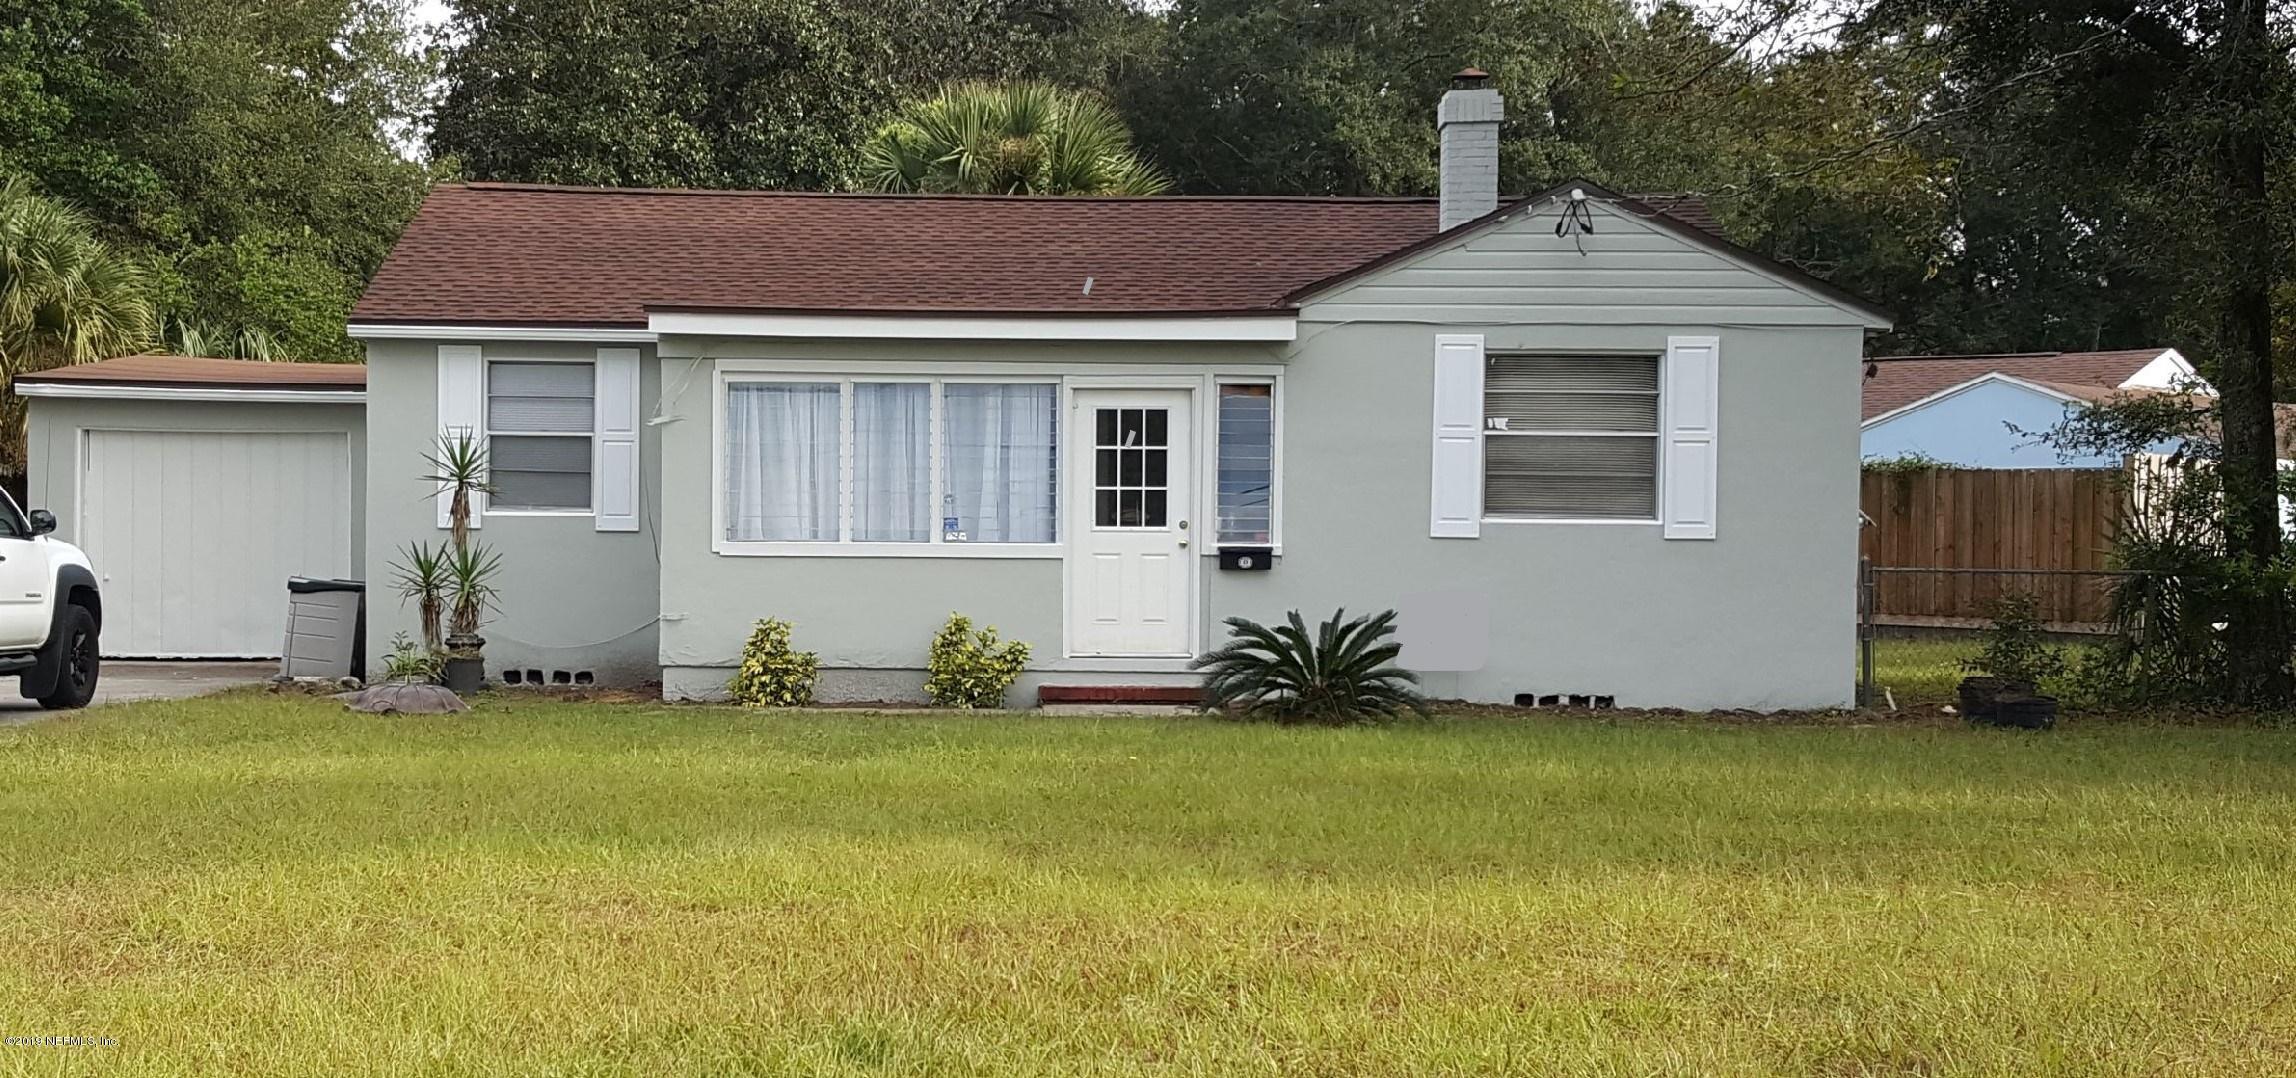 Photo of 2305 SOUTHSIDE, JACKSONVILLE, FL 32216